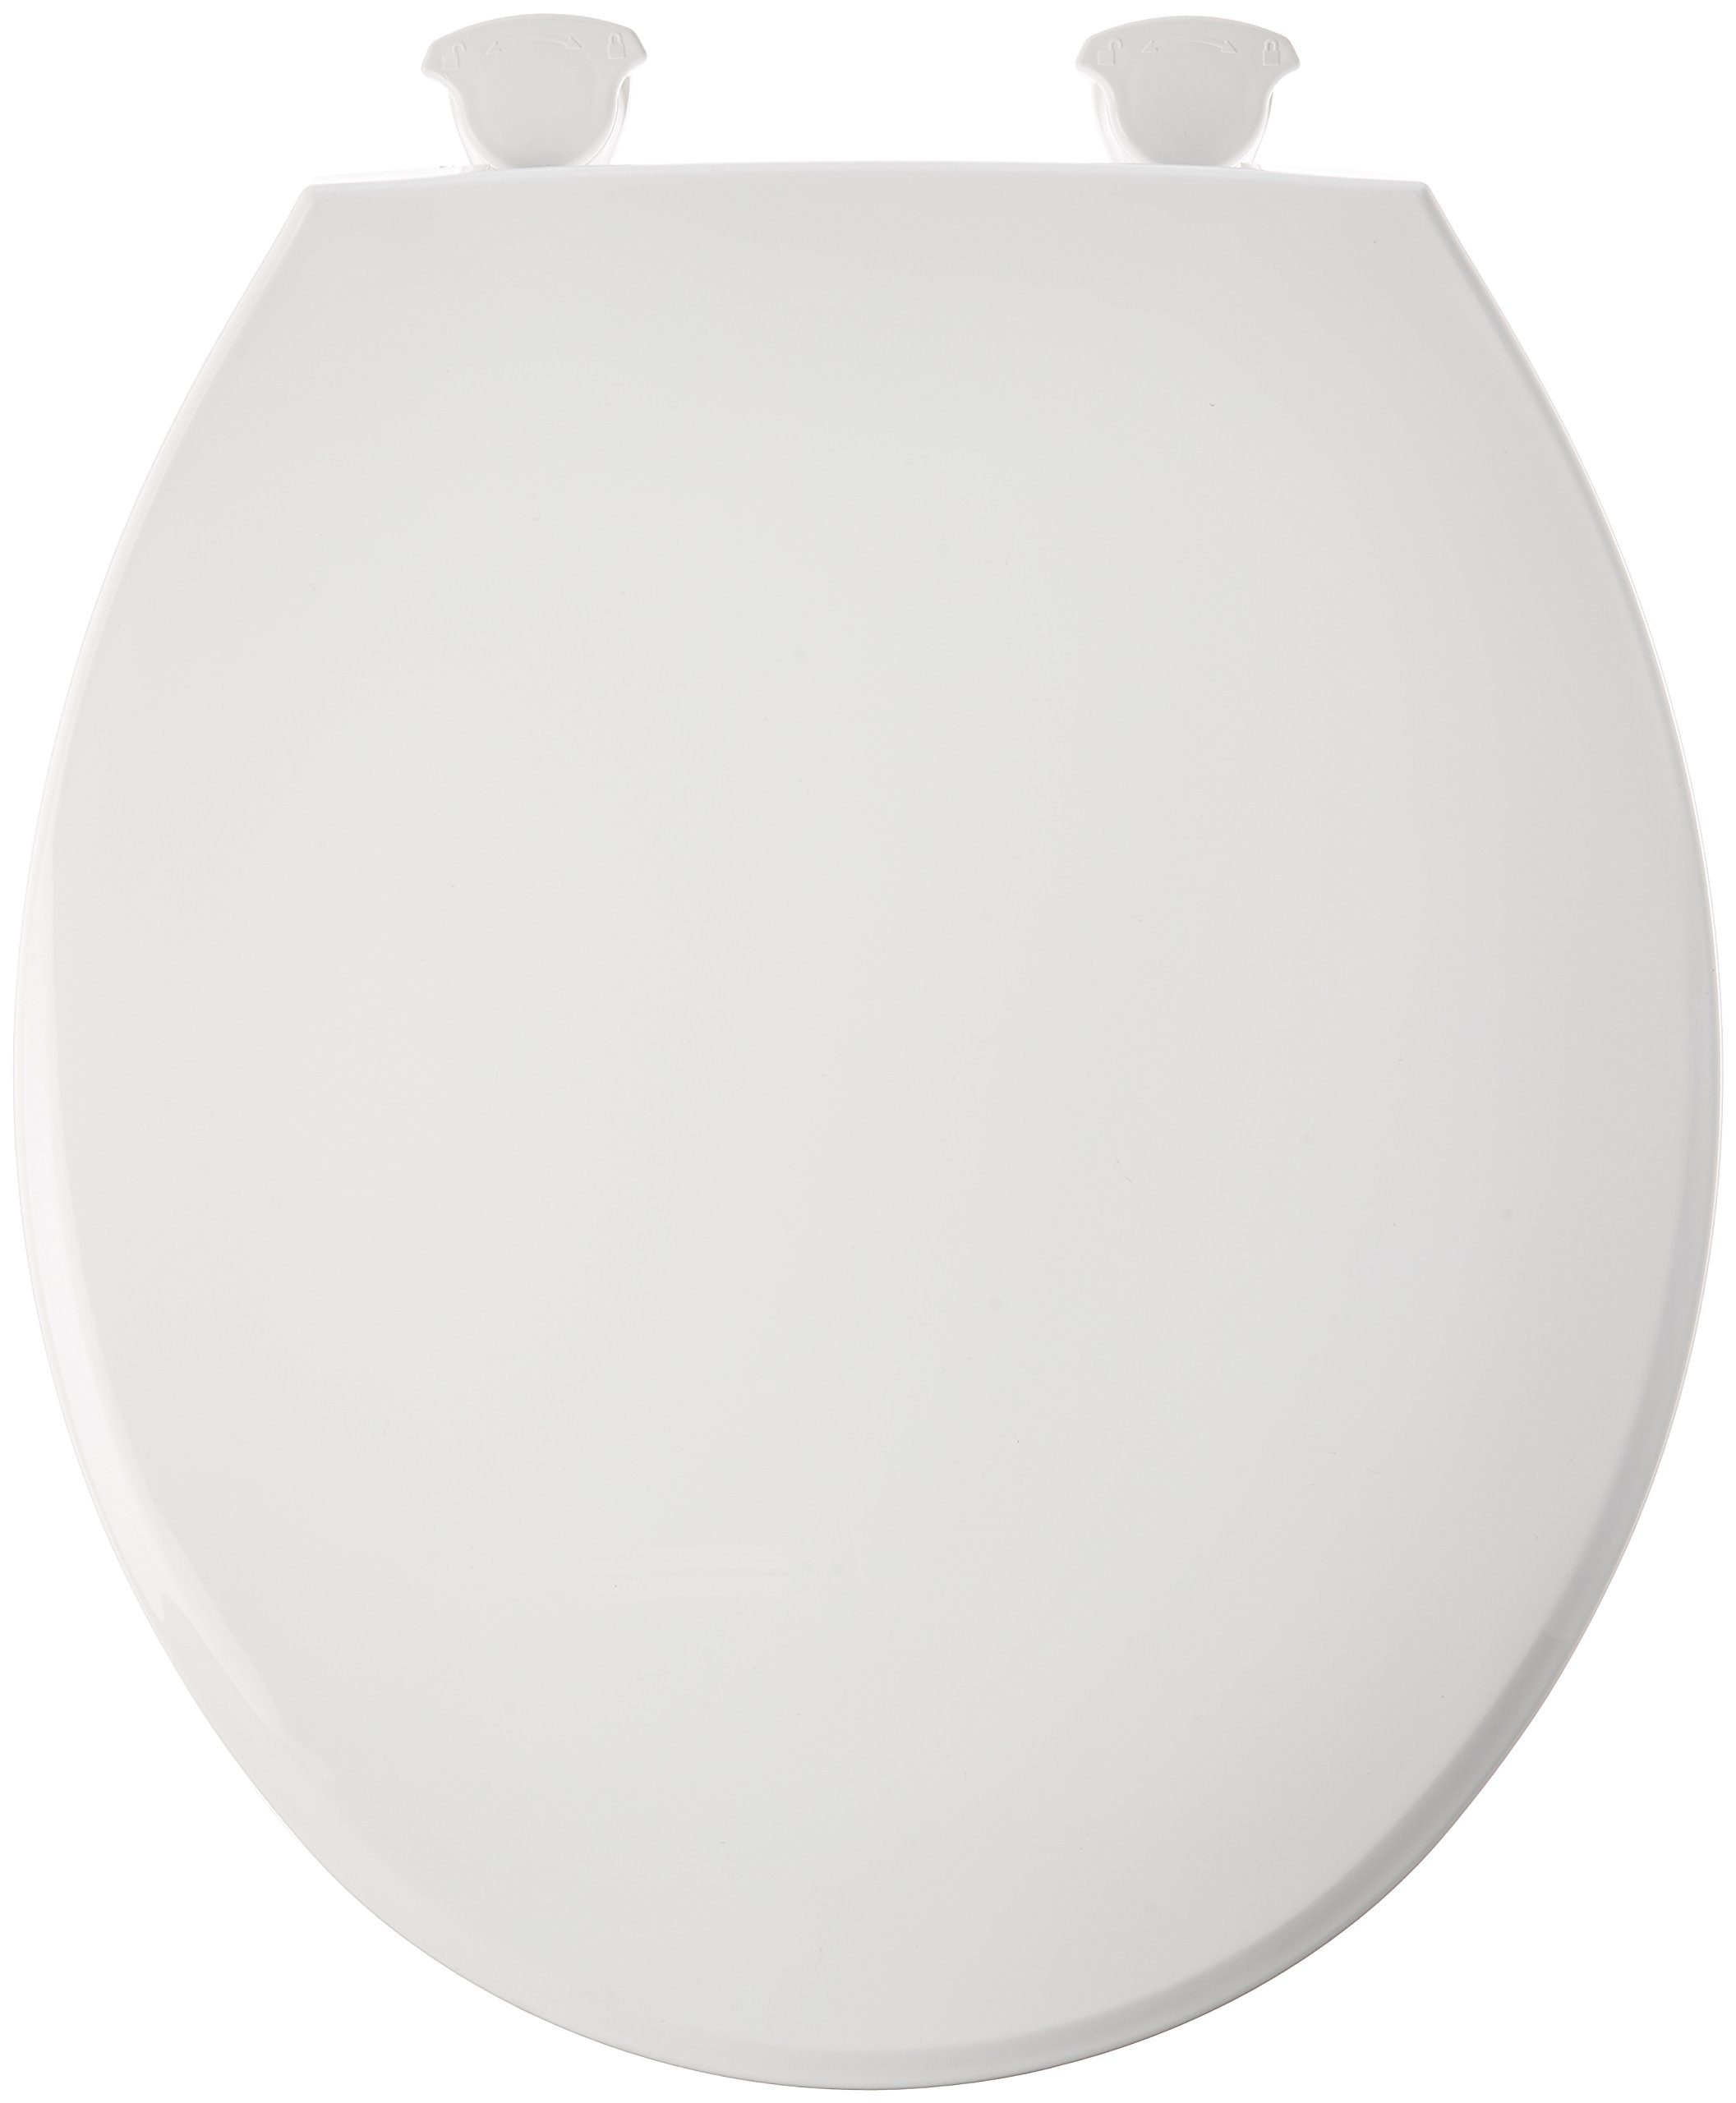 Bemis 800ec000 Plastic Round Toilet Seat With Easy Clean